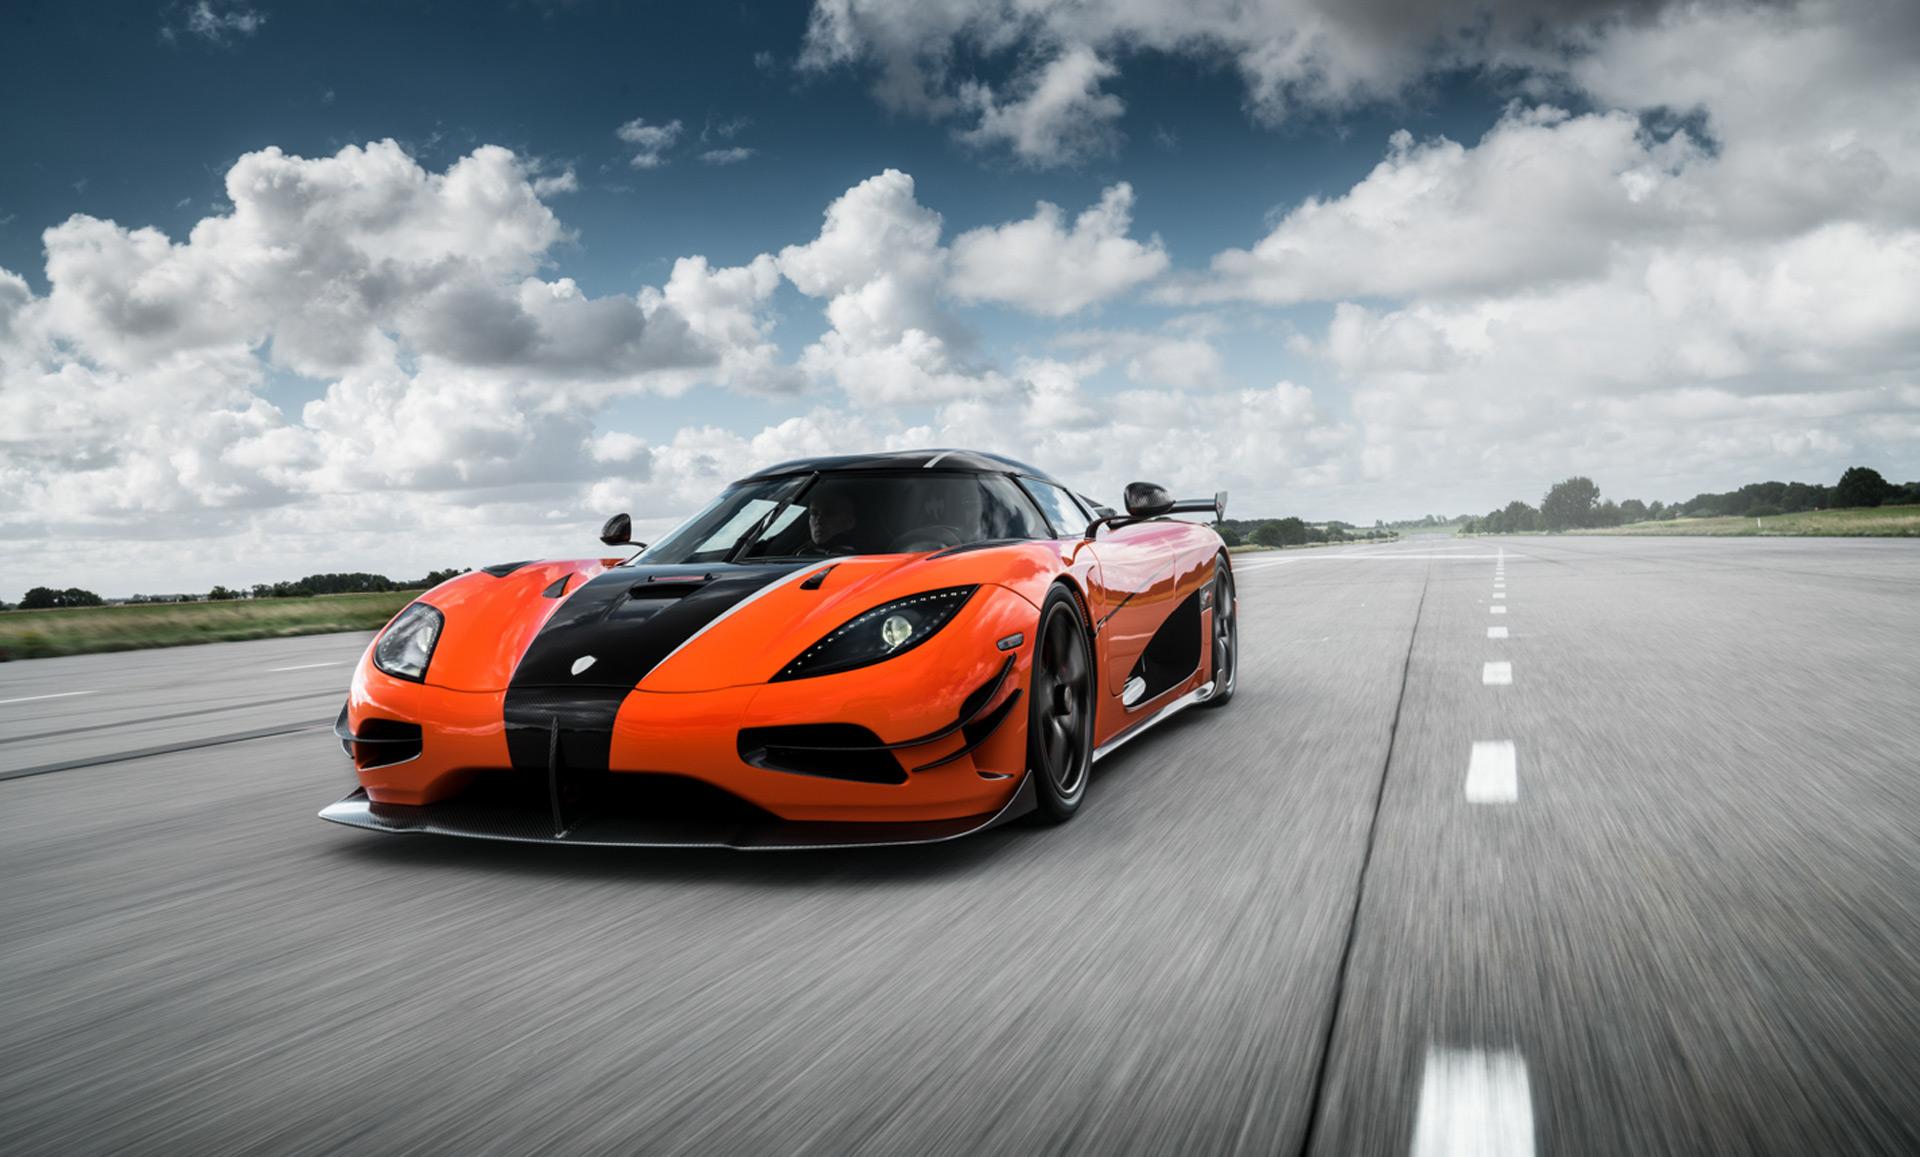 4k Car Wallpaper Koenigsegg Rs First U S Spec Koenigsegg Agera Rs To Land In Monterey